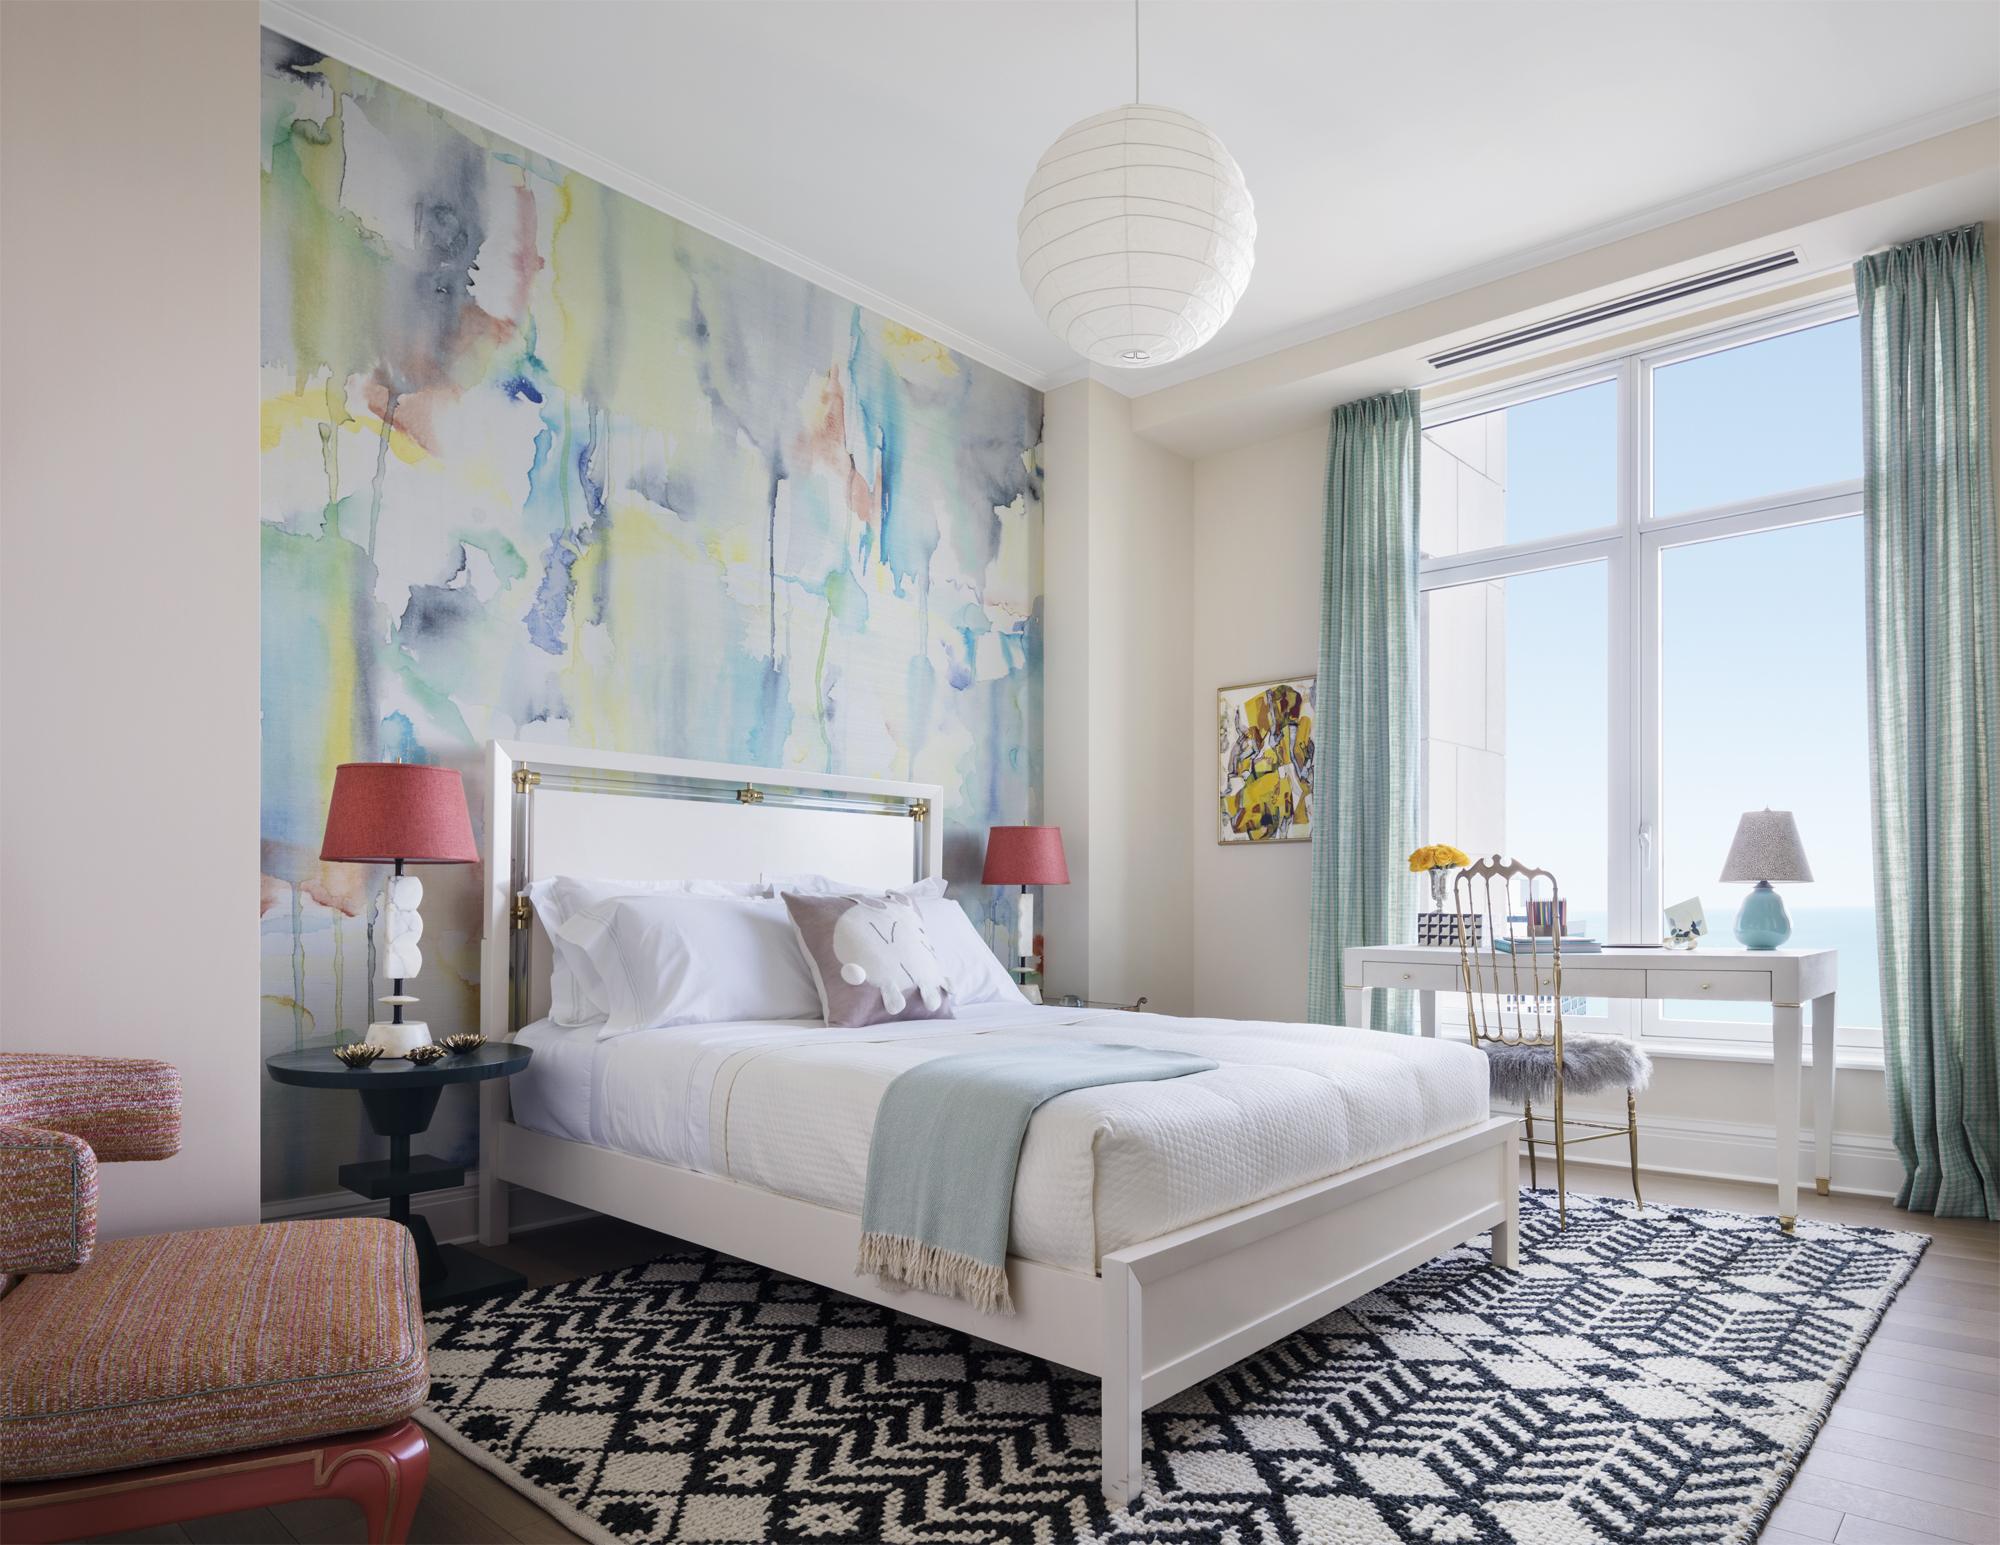 10_One-Bennett-Park-Condominium-5106-Secondary-Bedroom.jpg